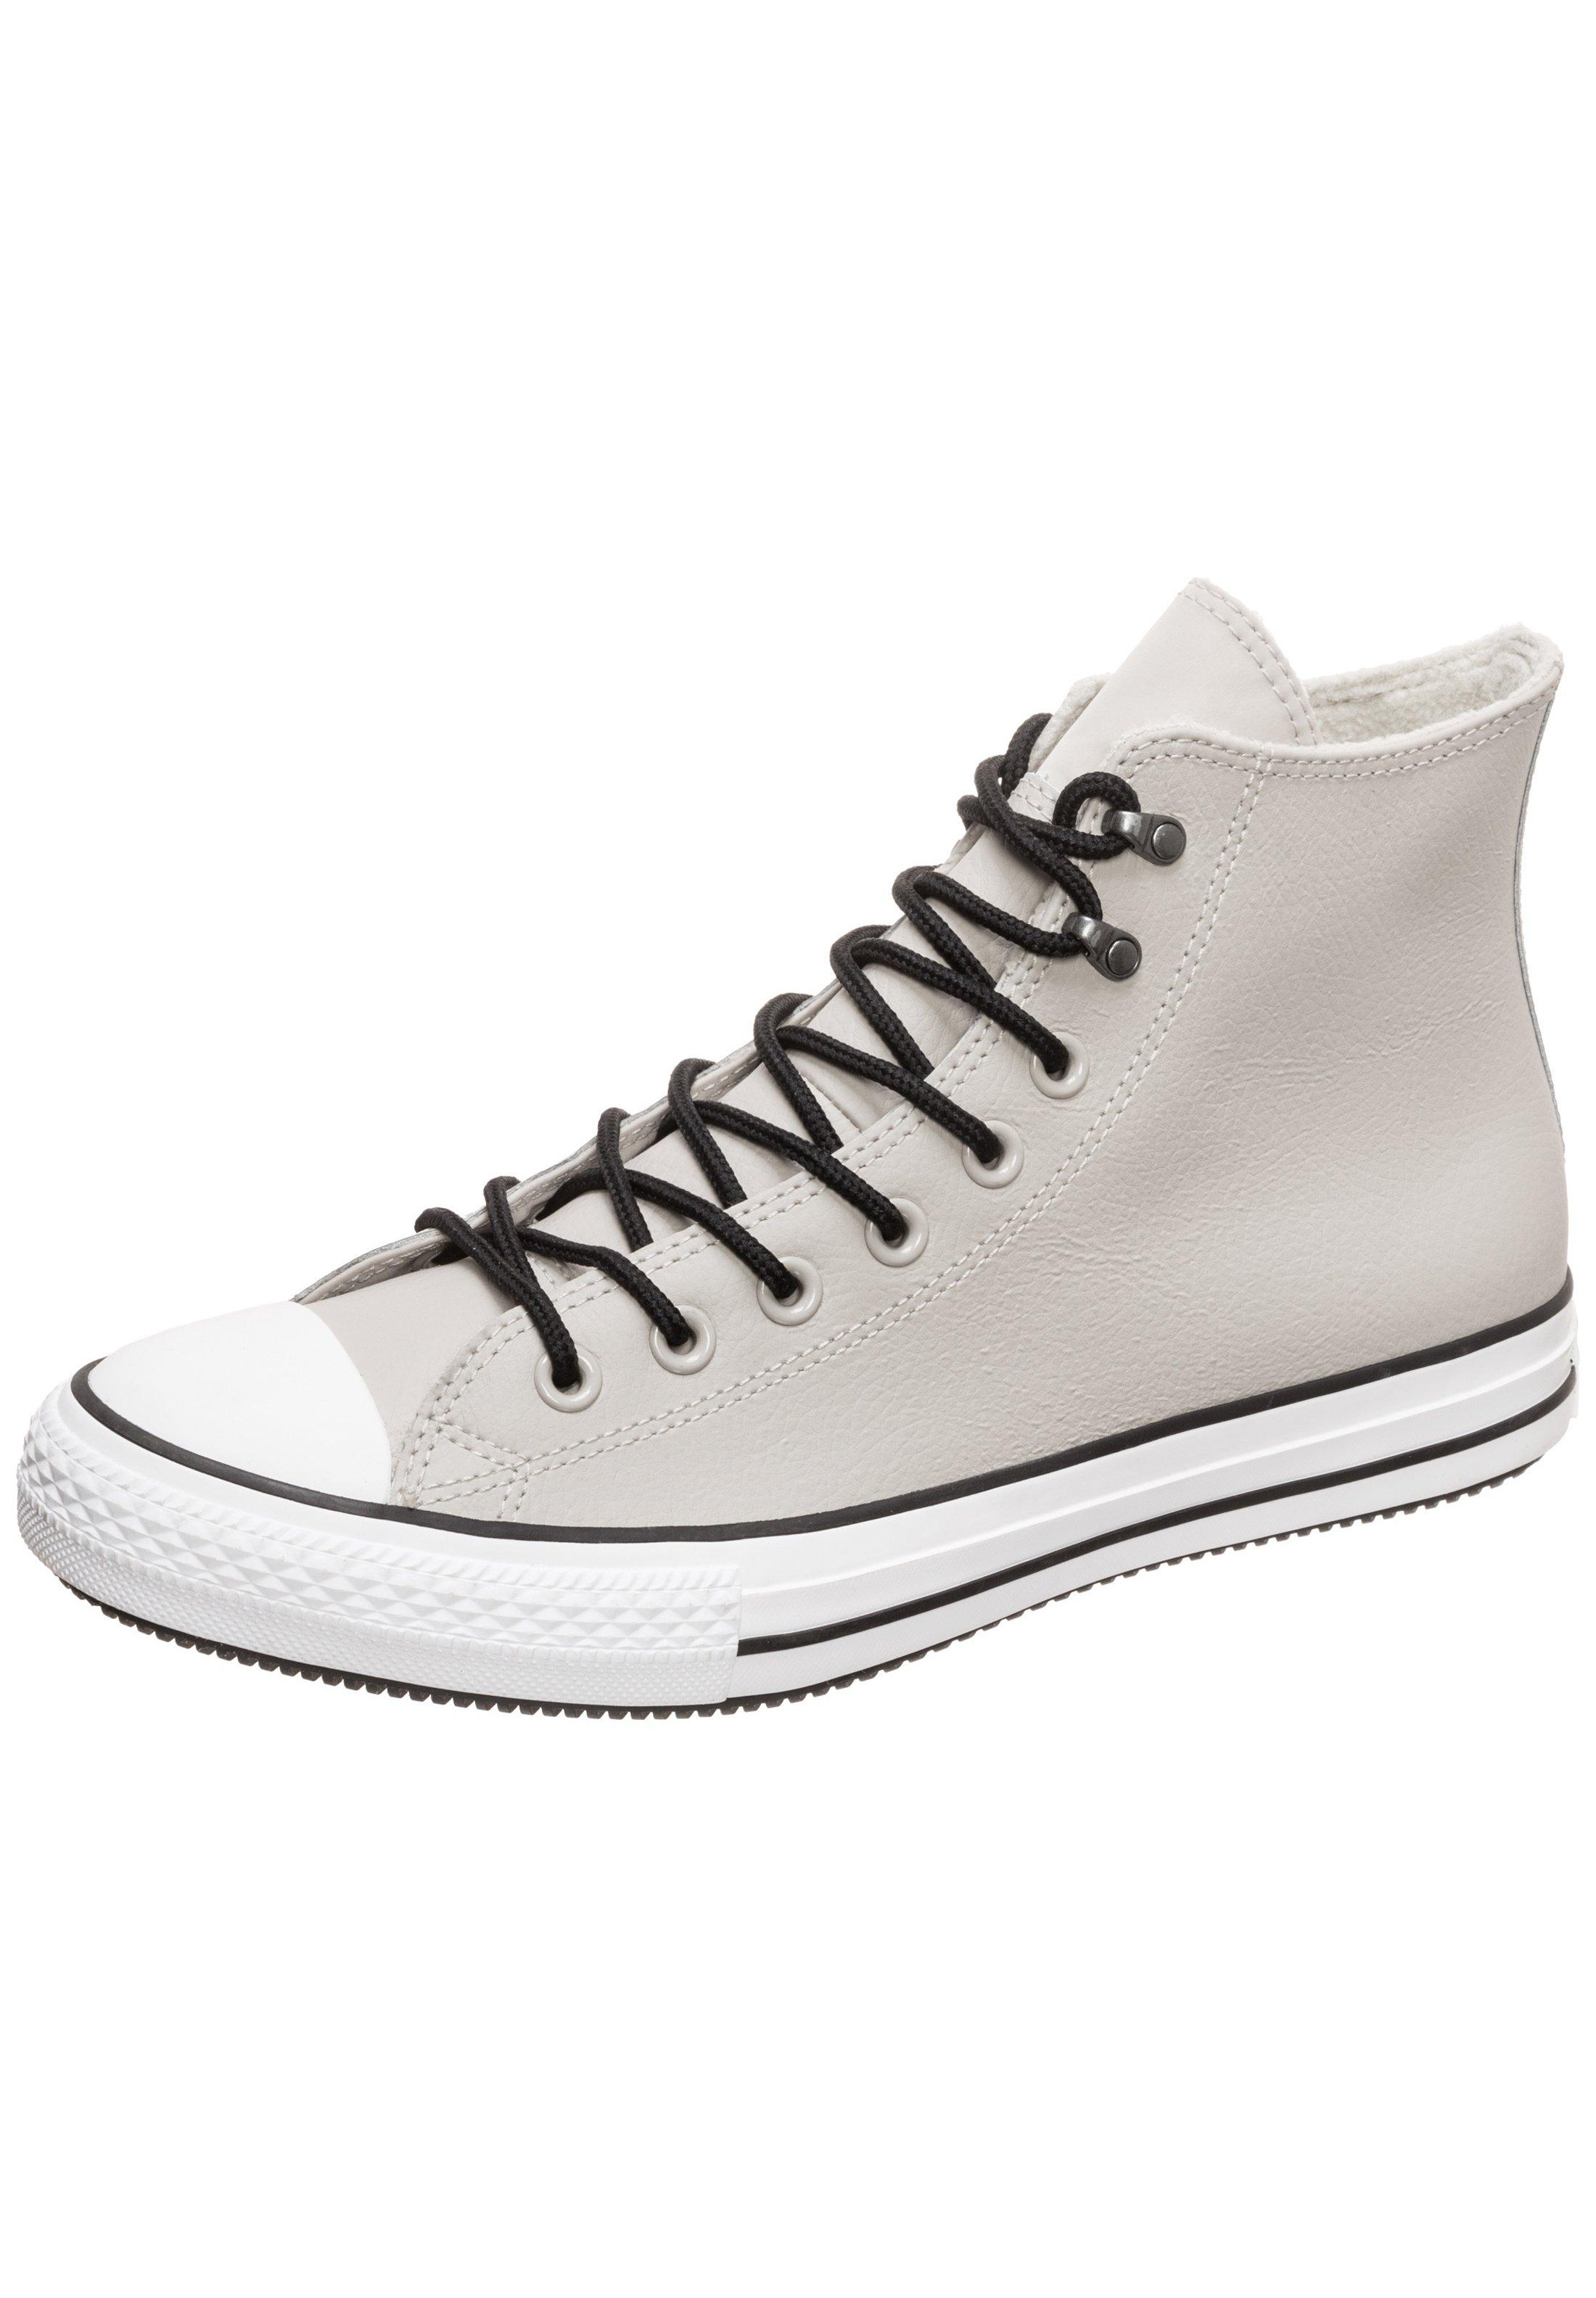 CONVERSE CHUCK TAYLOR ALL STAR WINTER LEATHER HI SNEAKER Sneakers hoog birch barkwhiteblack